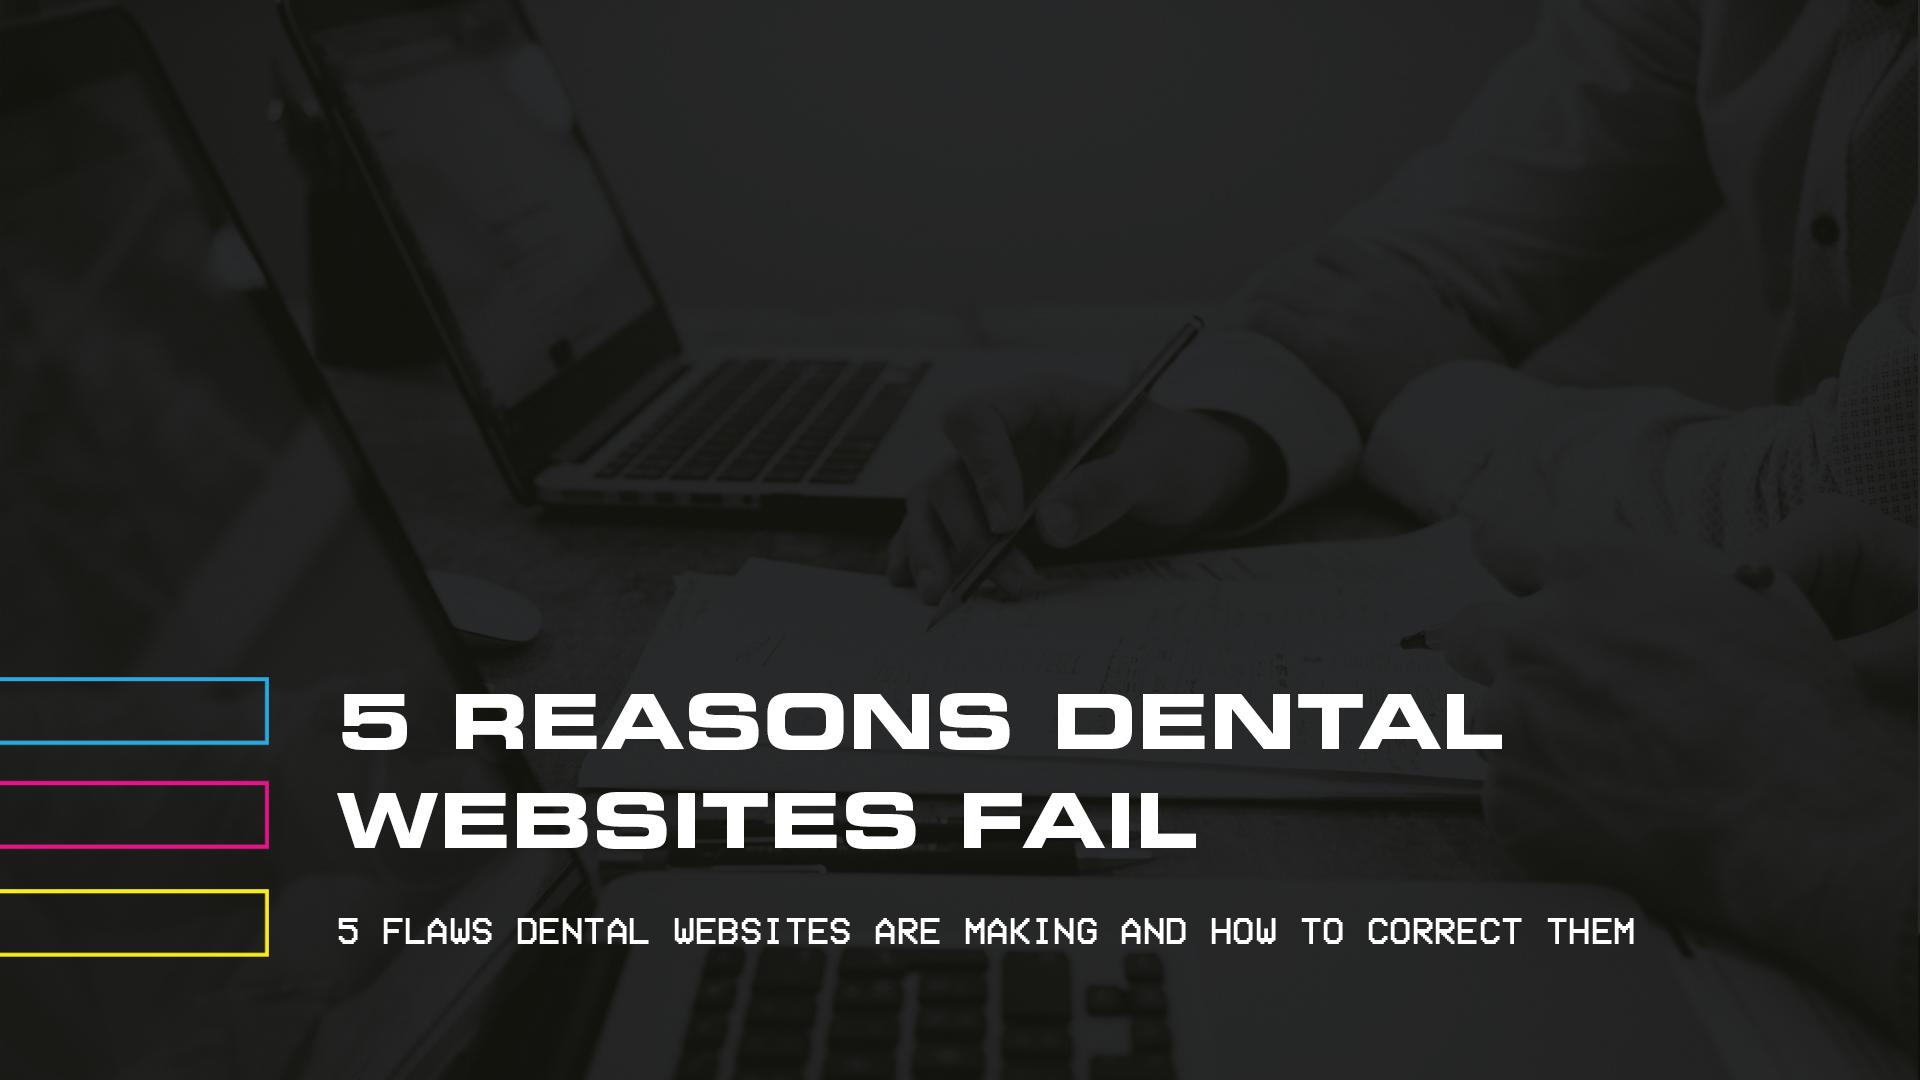 5 Reasons Dental Websites Fail